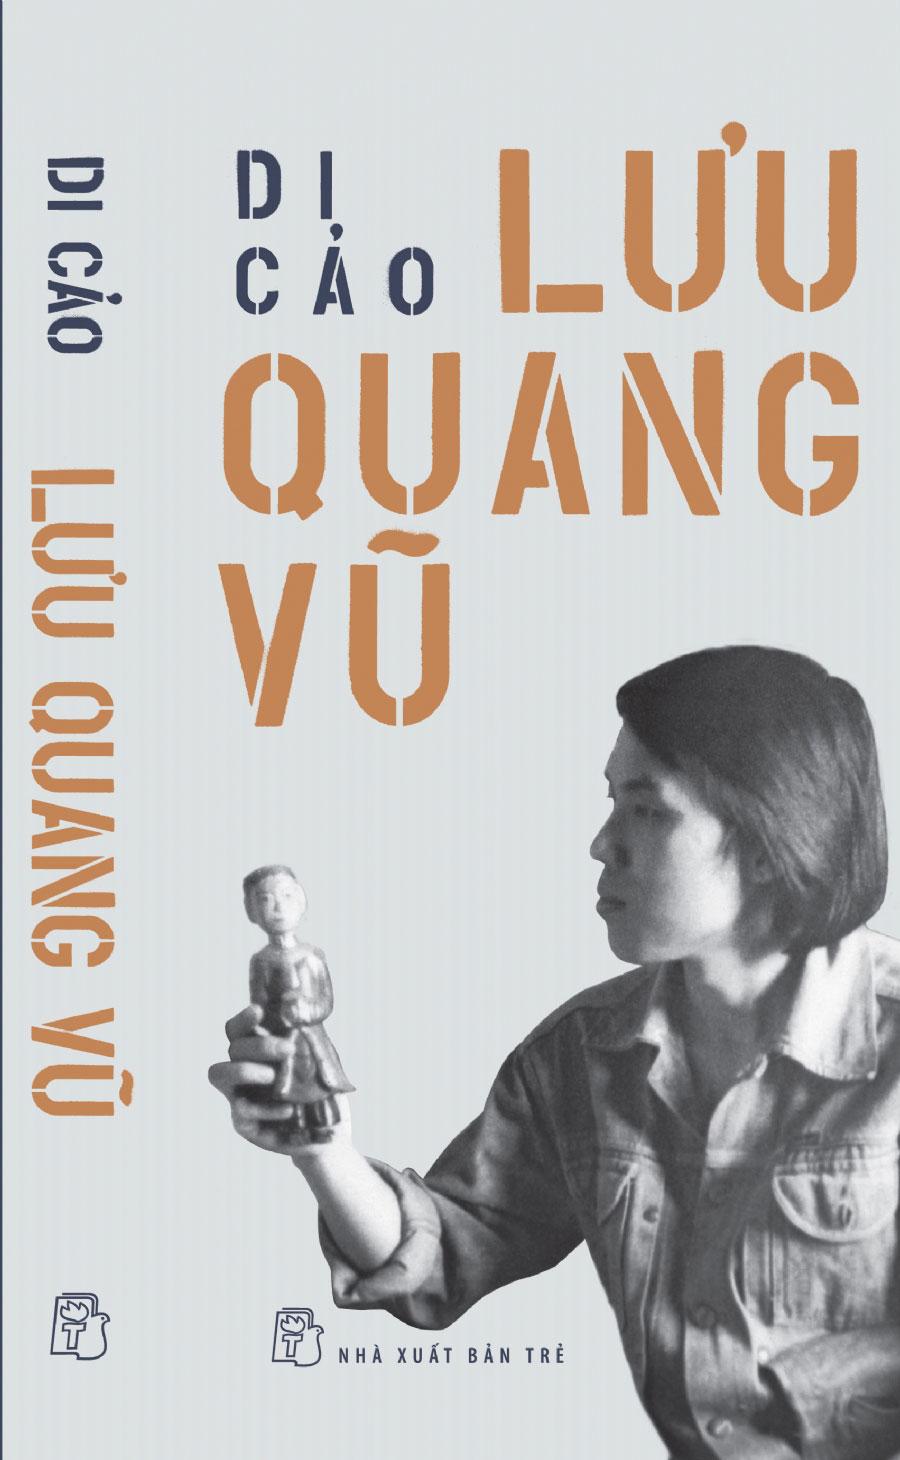 Di Cảo Lưu Quang Vũ - EBOOK/PDF/PRC/EPUB